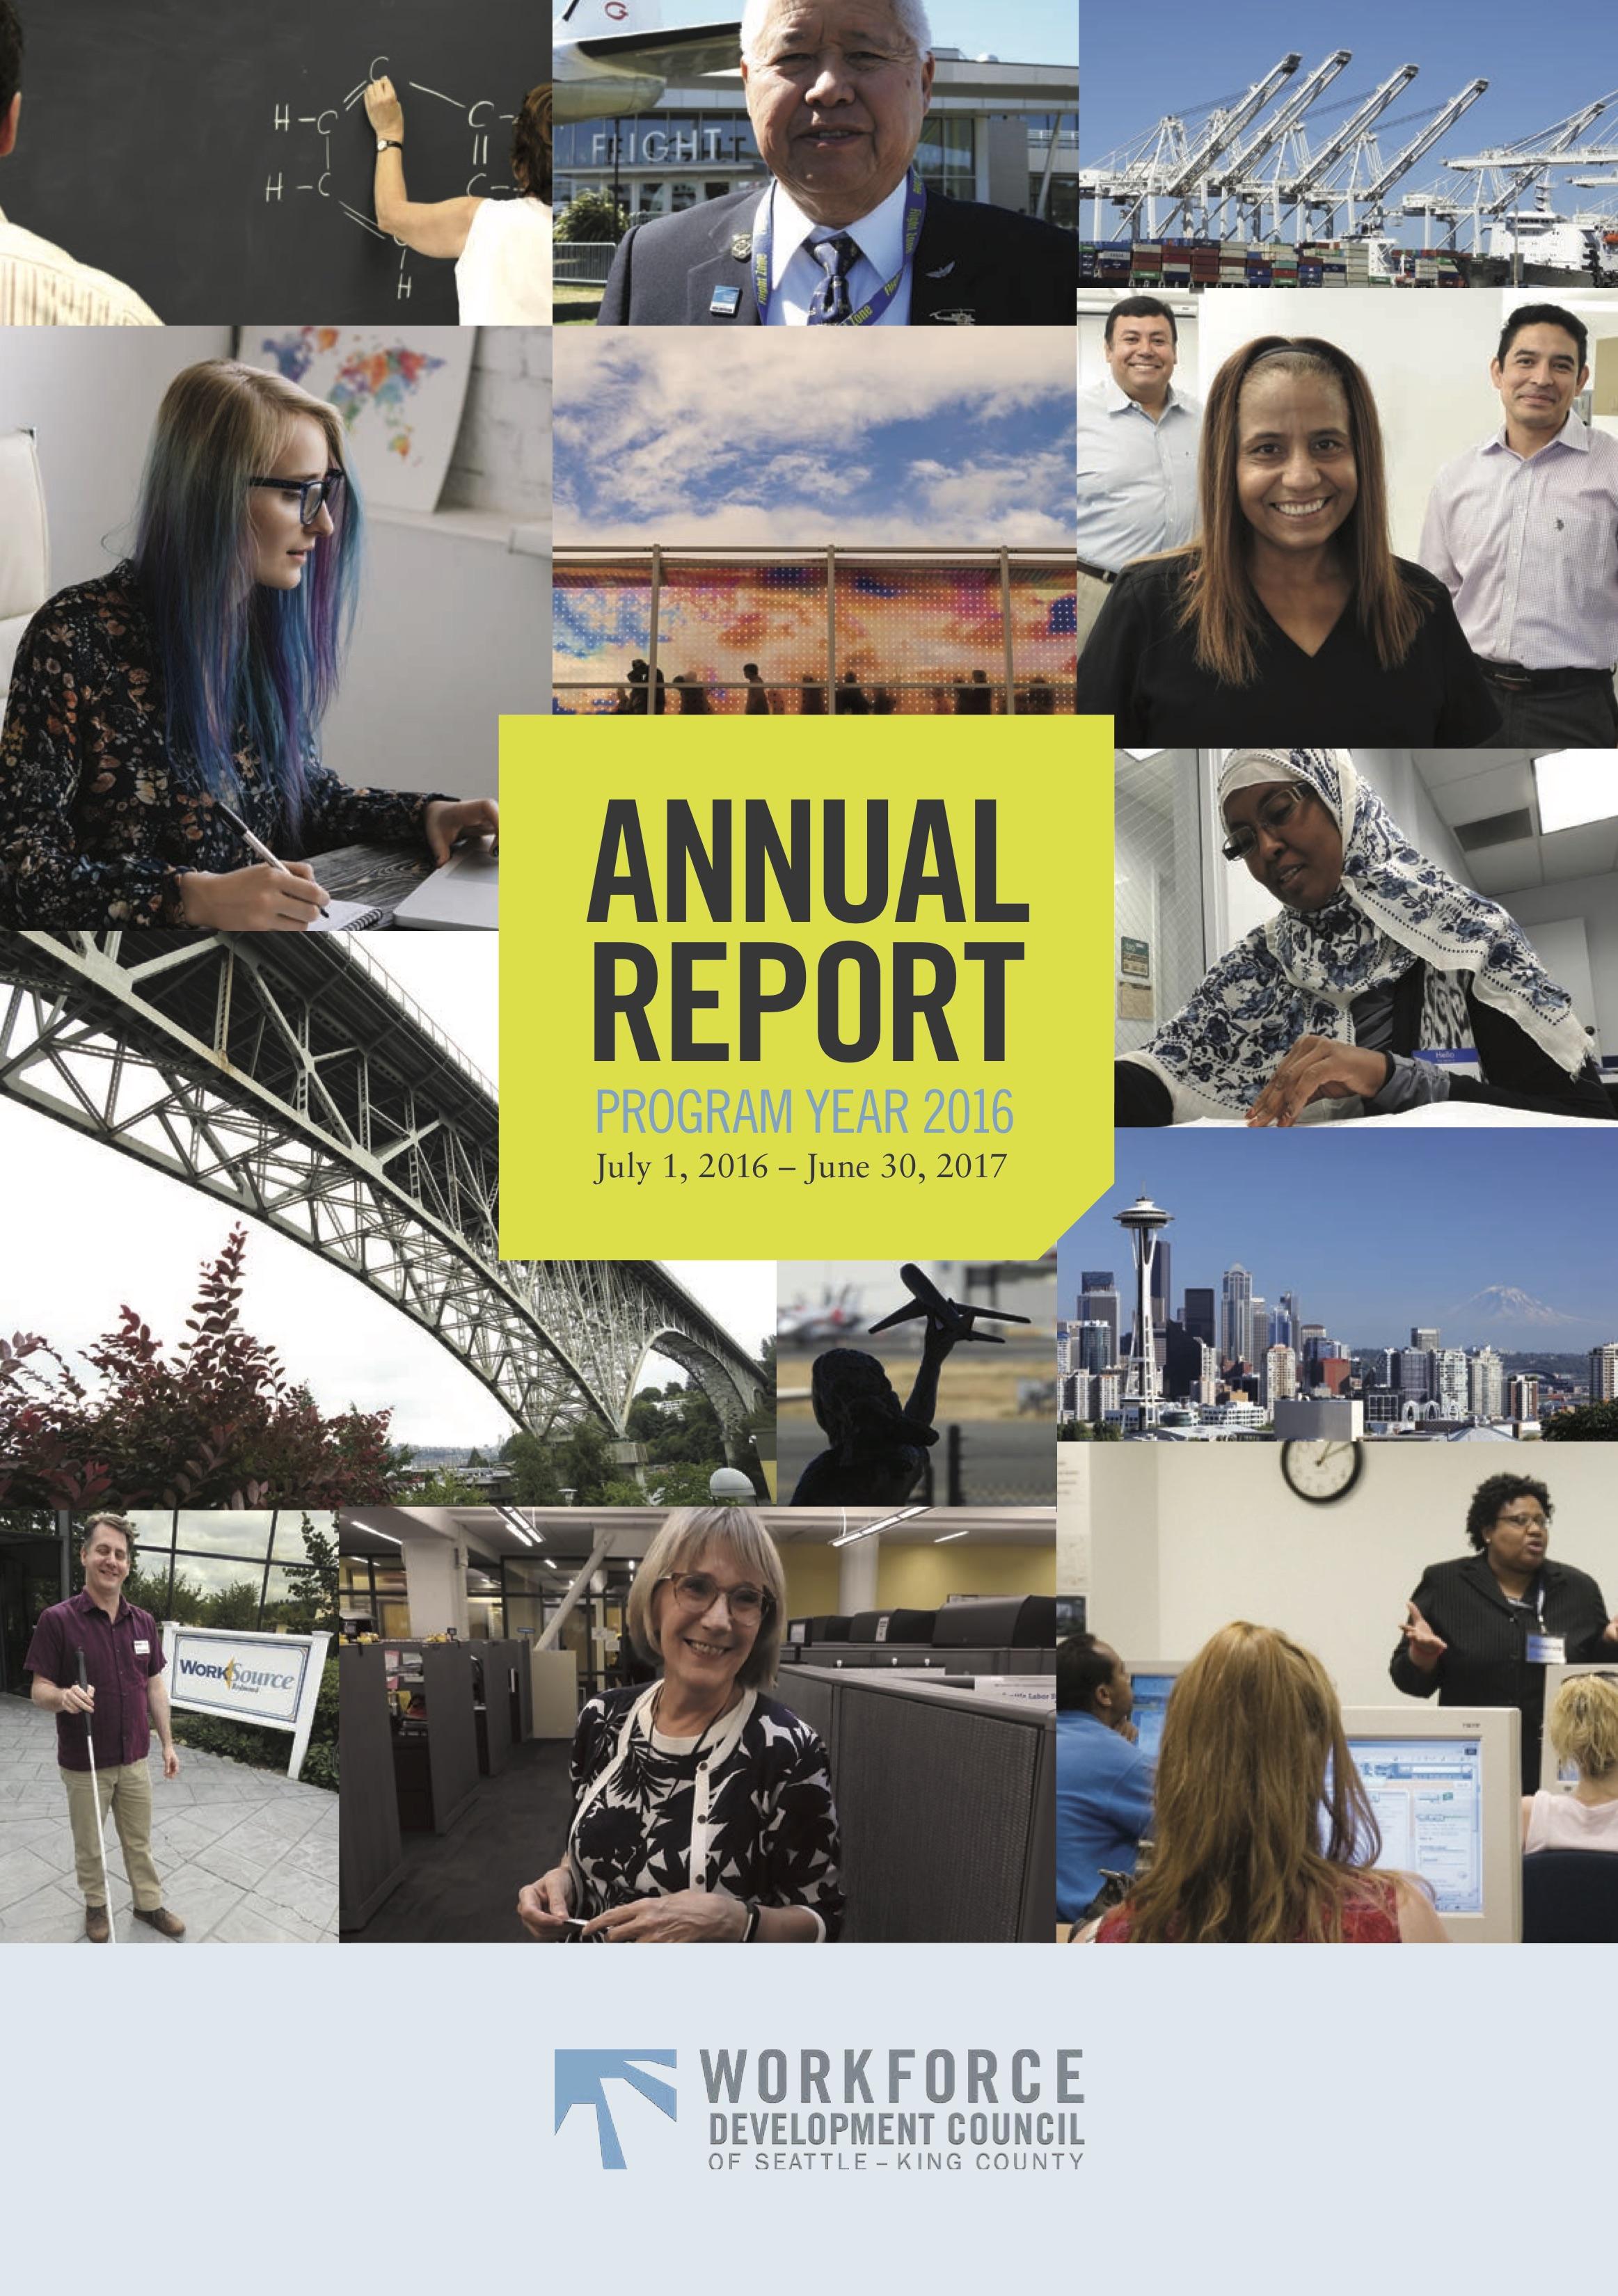 AnnualReport16_WDC-SKC_032018_WEB (dragged).jpg